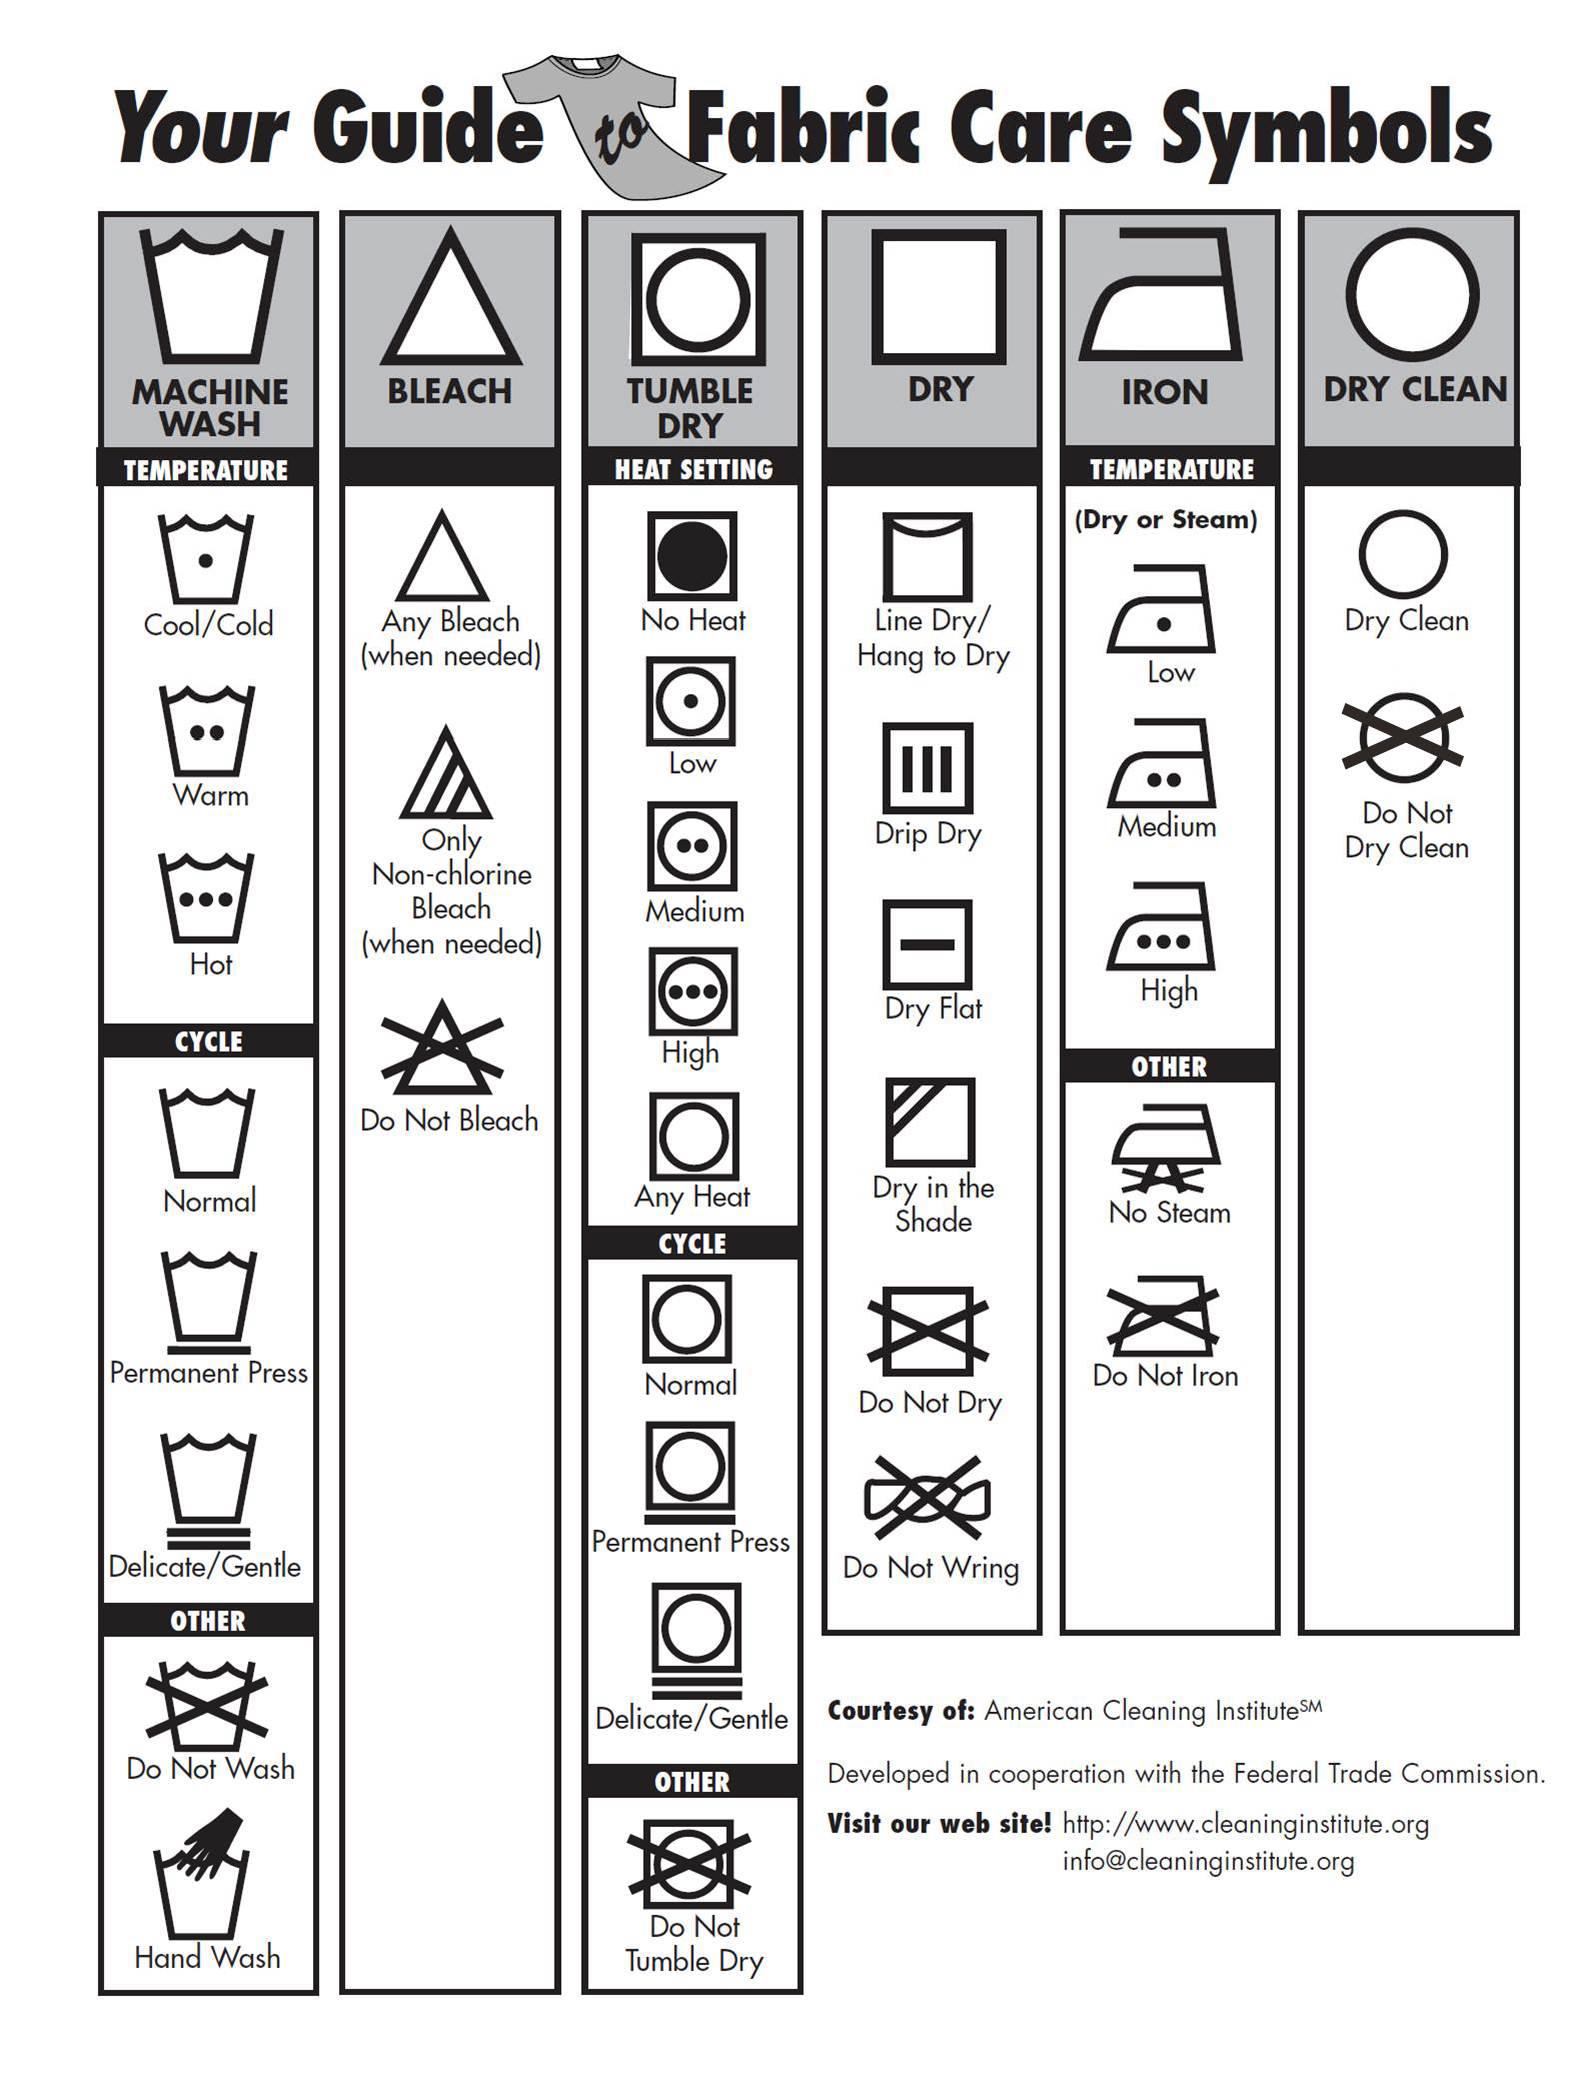 cooncord-Fabric_Care_Symbols2.jpg